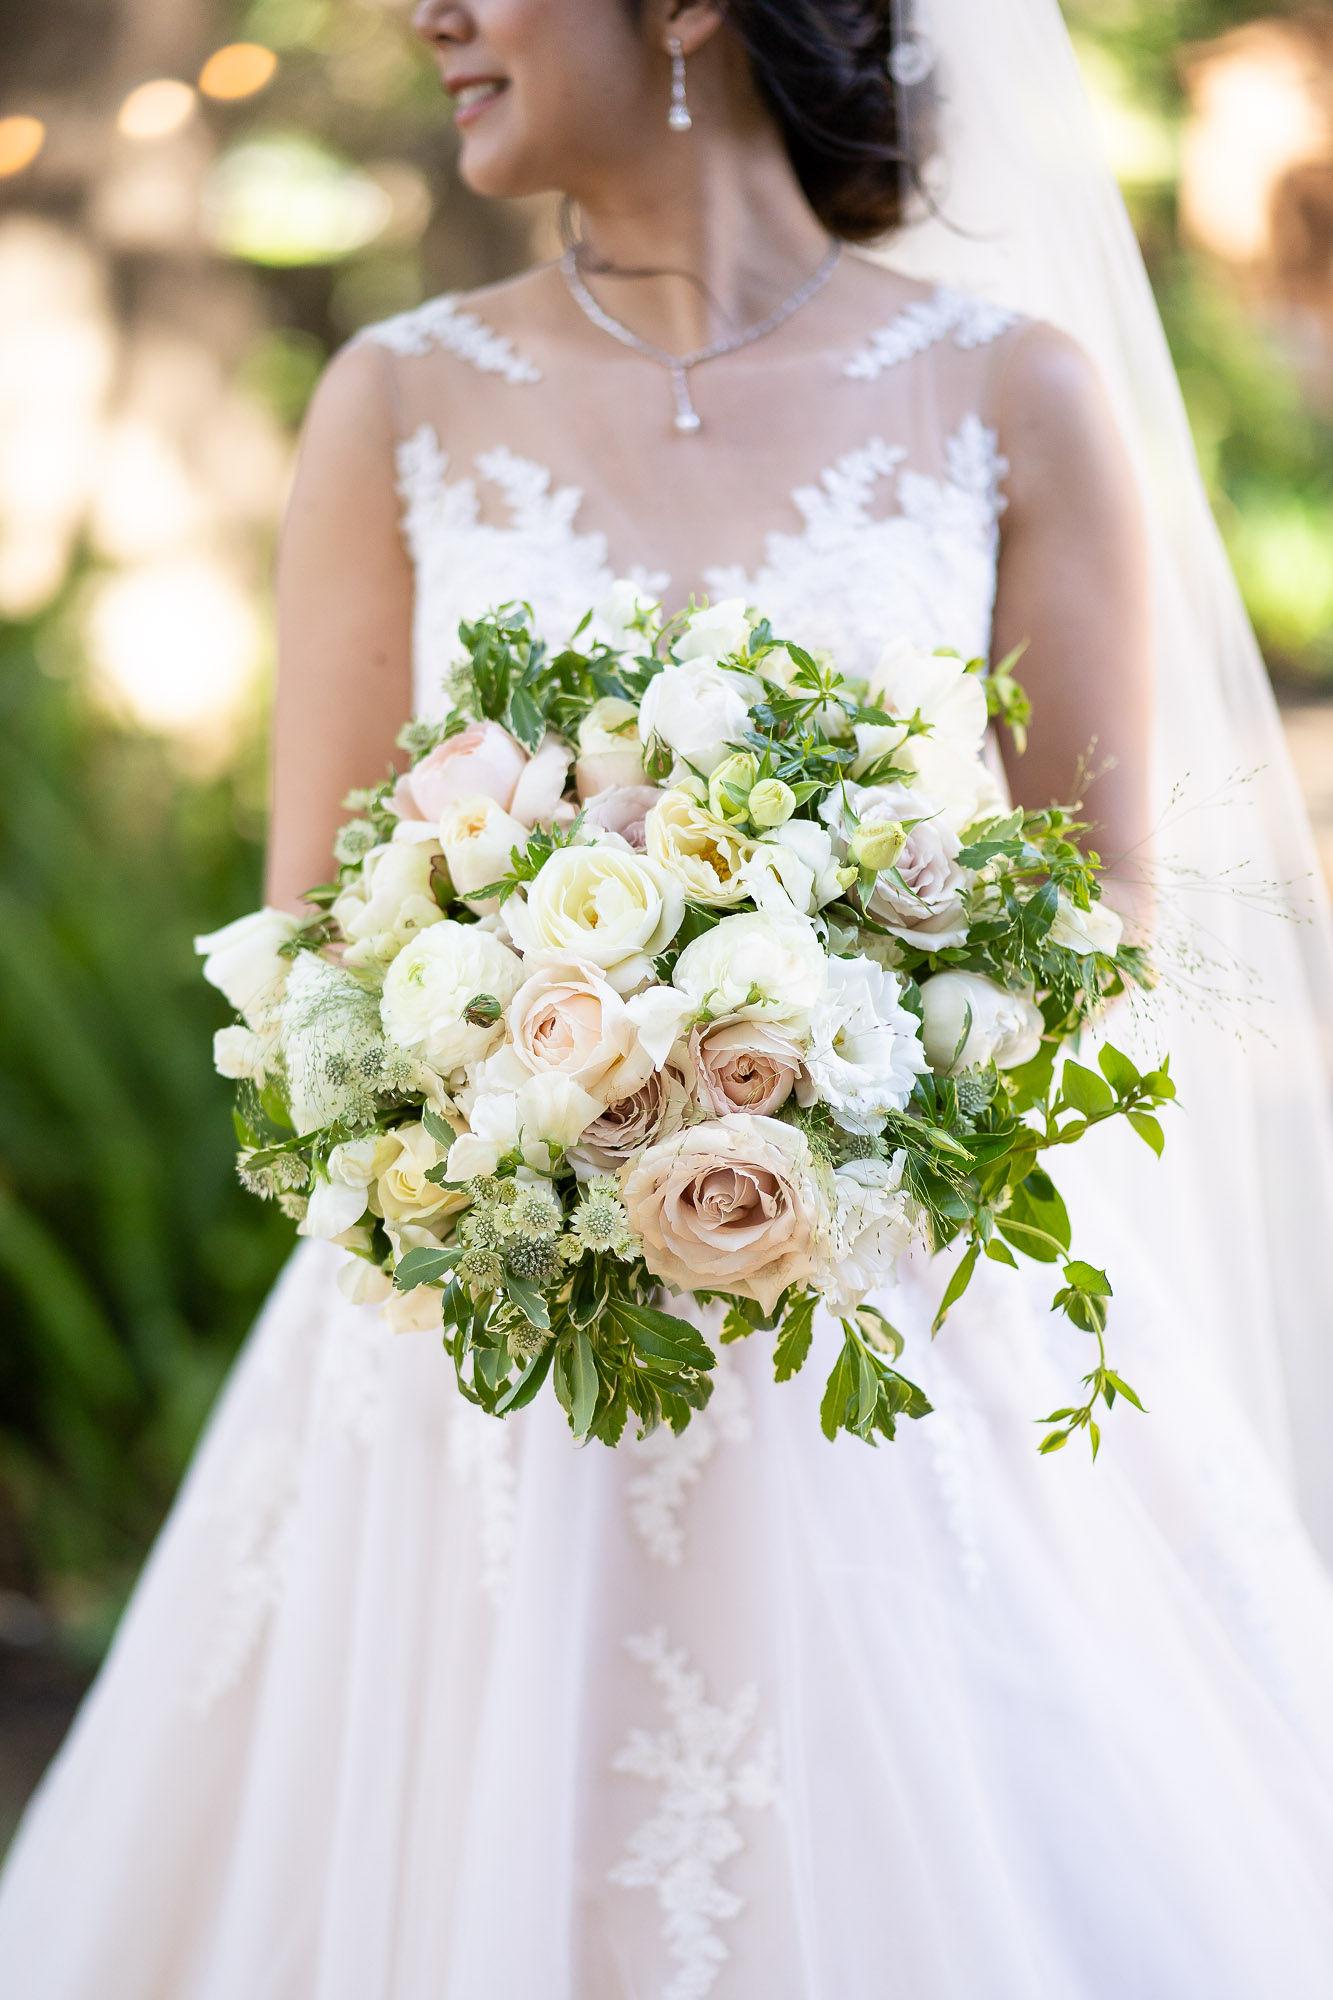 Resized-S&S-WeddingHighlights-18.jpg